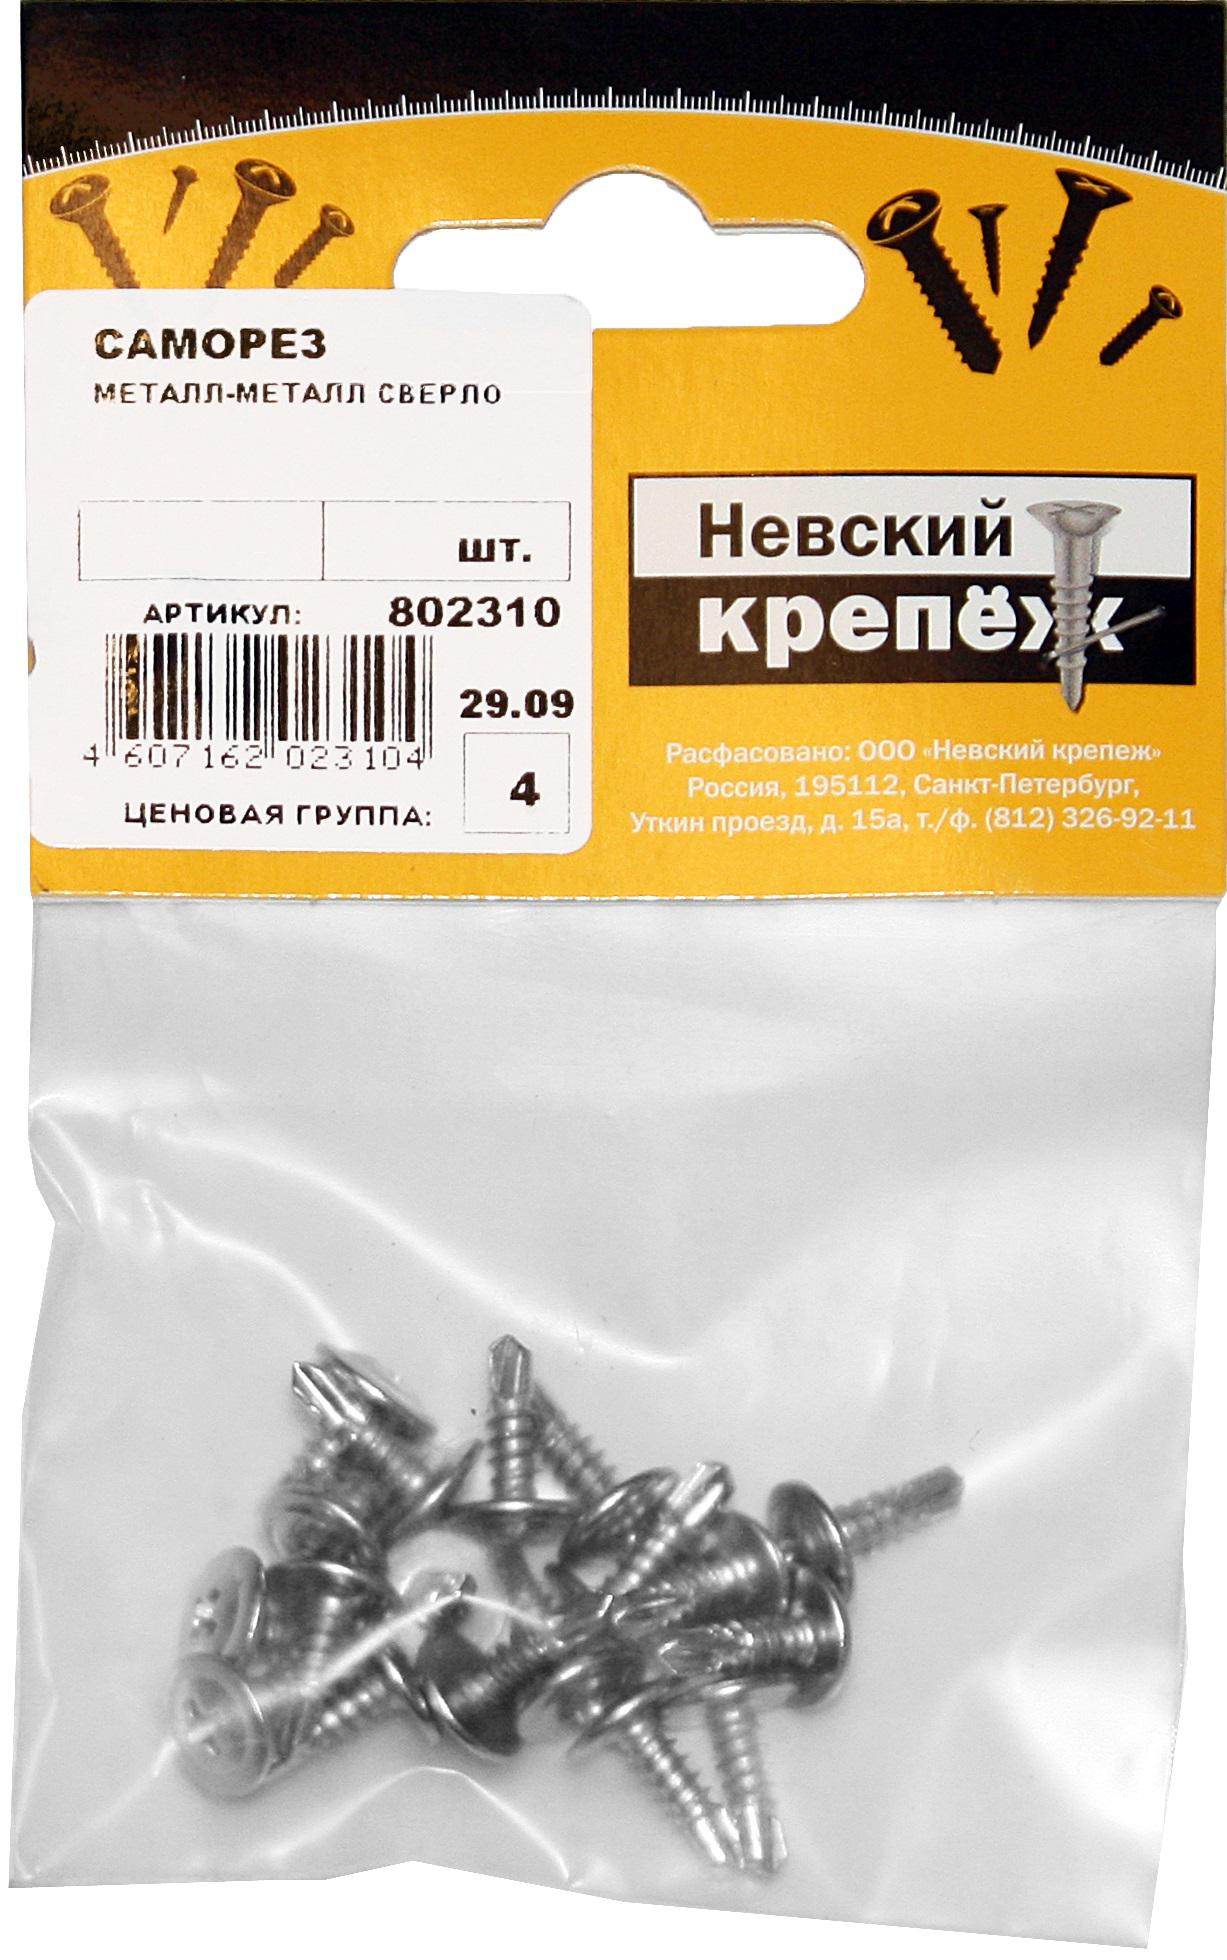 Саморез НЕВСКИЙ КРЕПЕЖ 802310